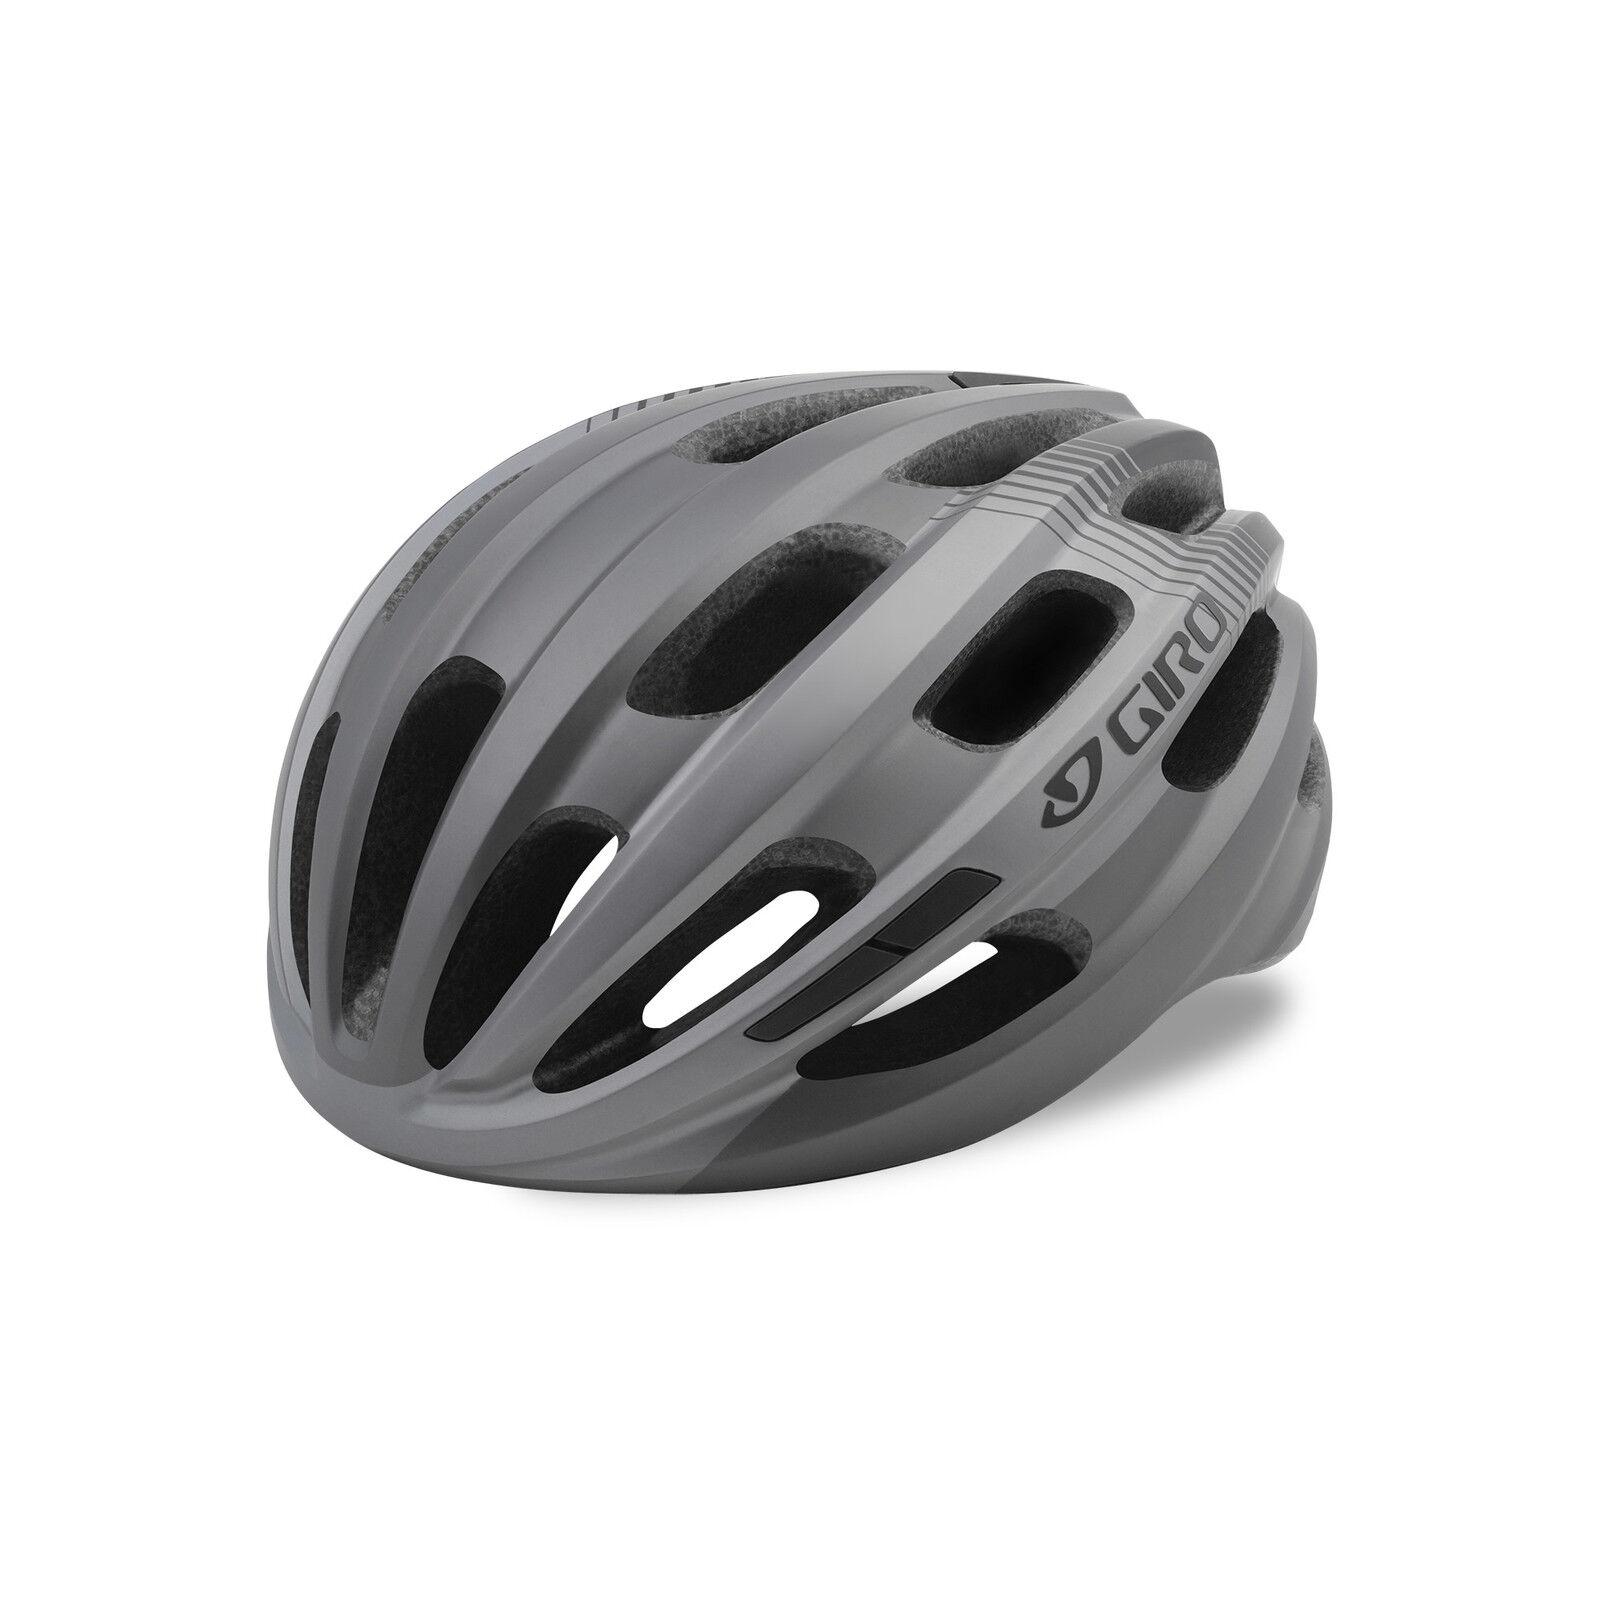 Giro Isode Fahrrad Helm Gr. 54-61cm grey 2019